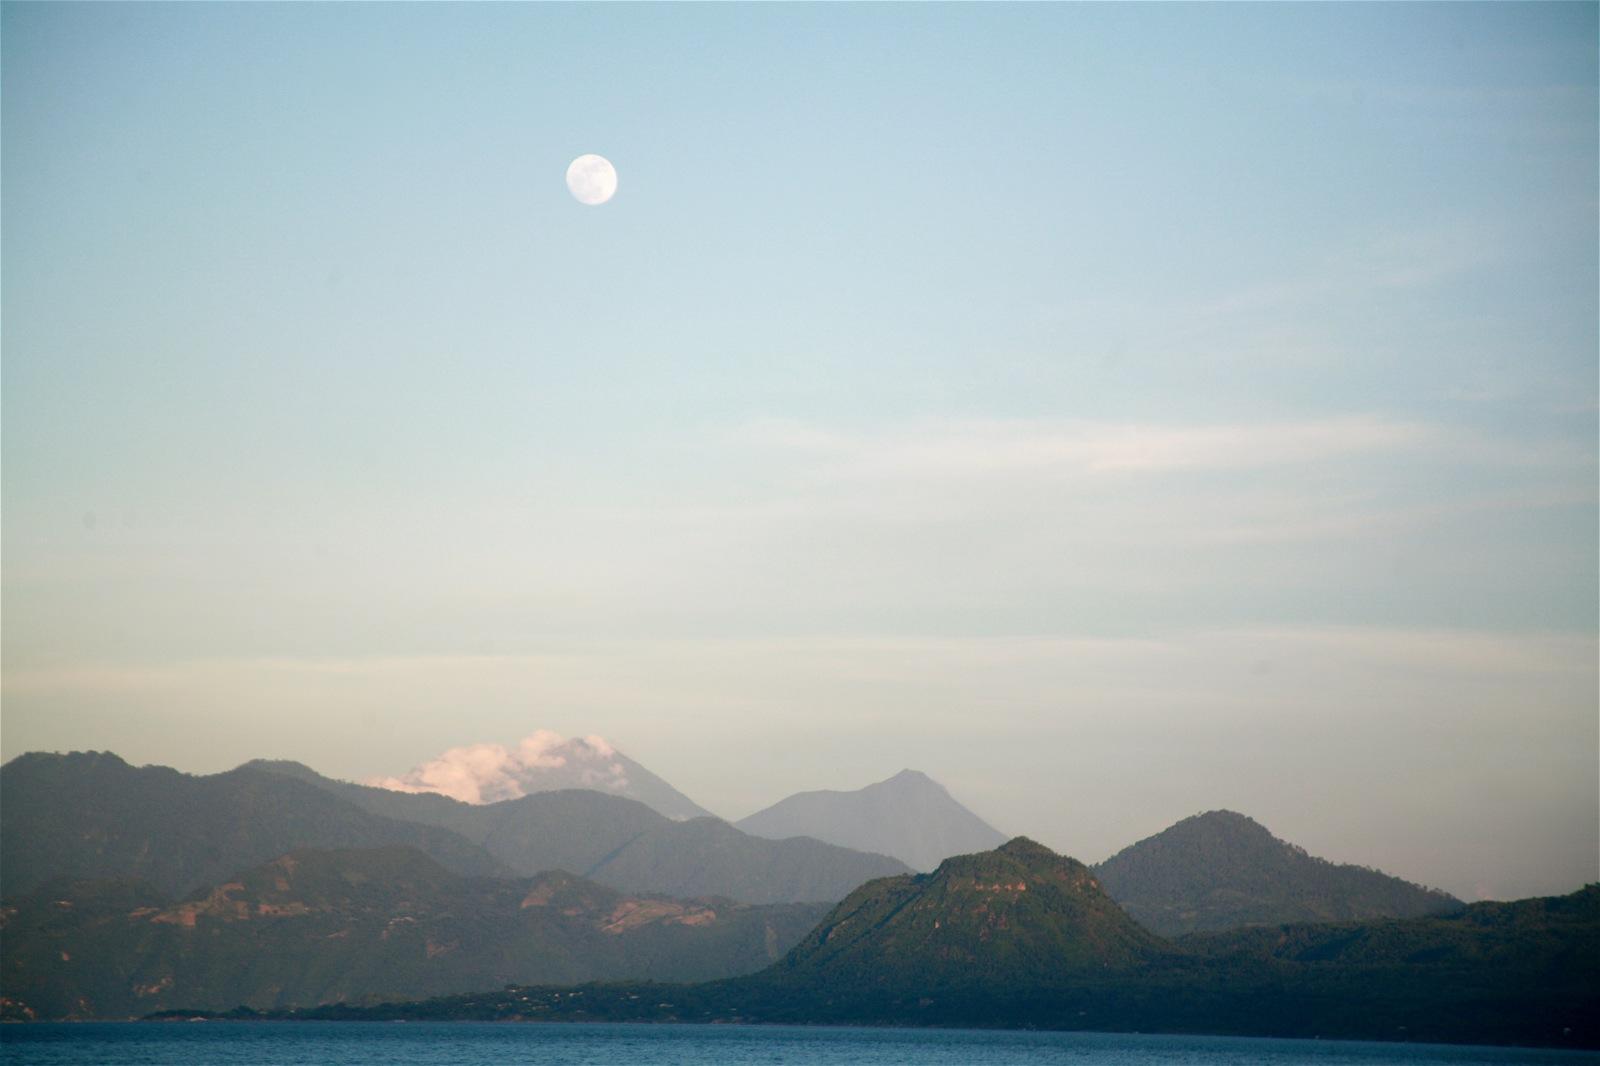 Guatemala Season: December - February   Lago Atitlan / Tikal / Antigua / Semuc Champey / culinary tour / horseback riding / volcano climbing / exploring Mayan ruins